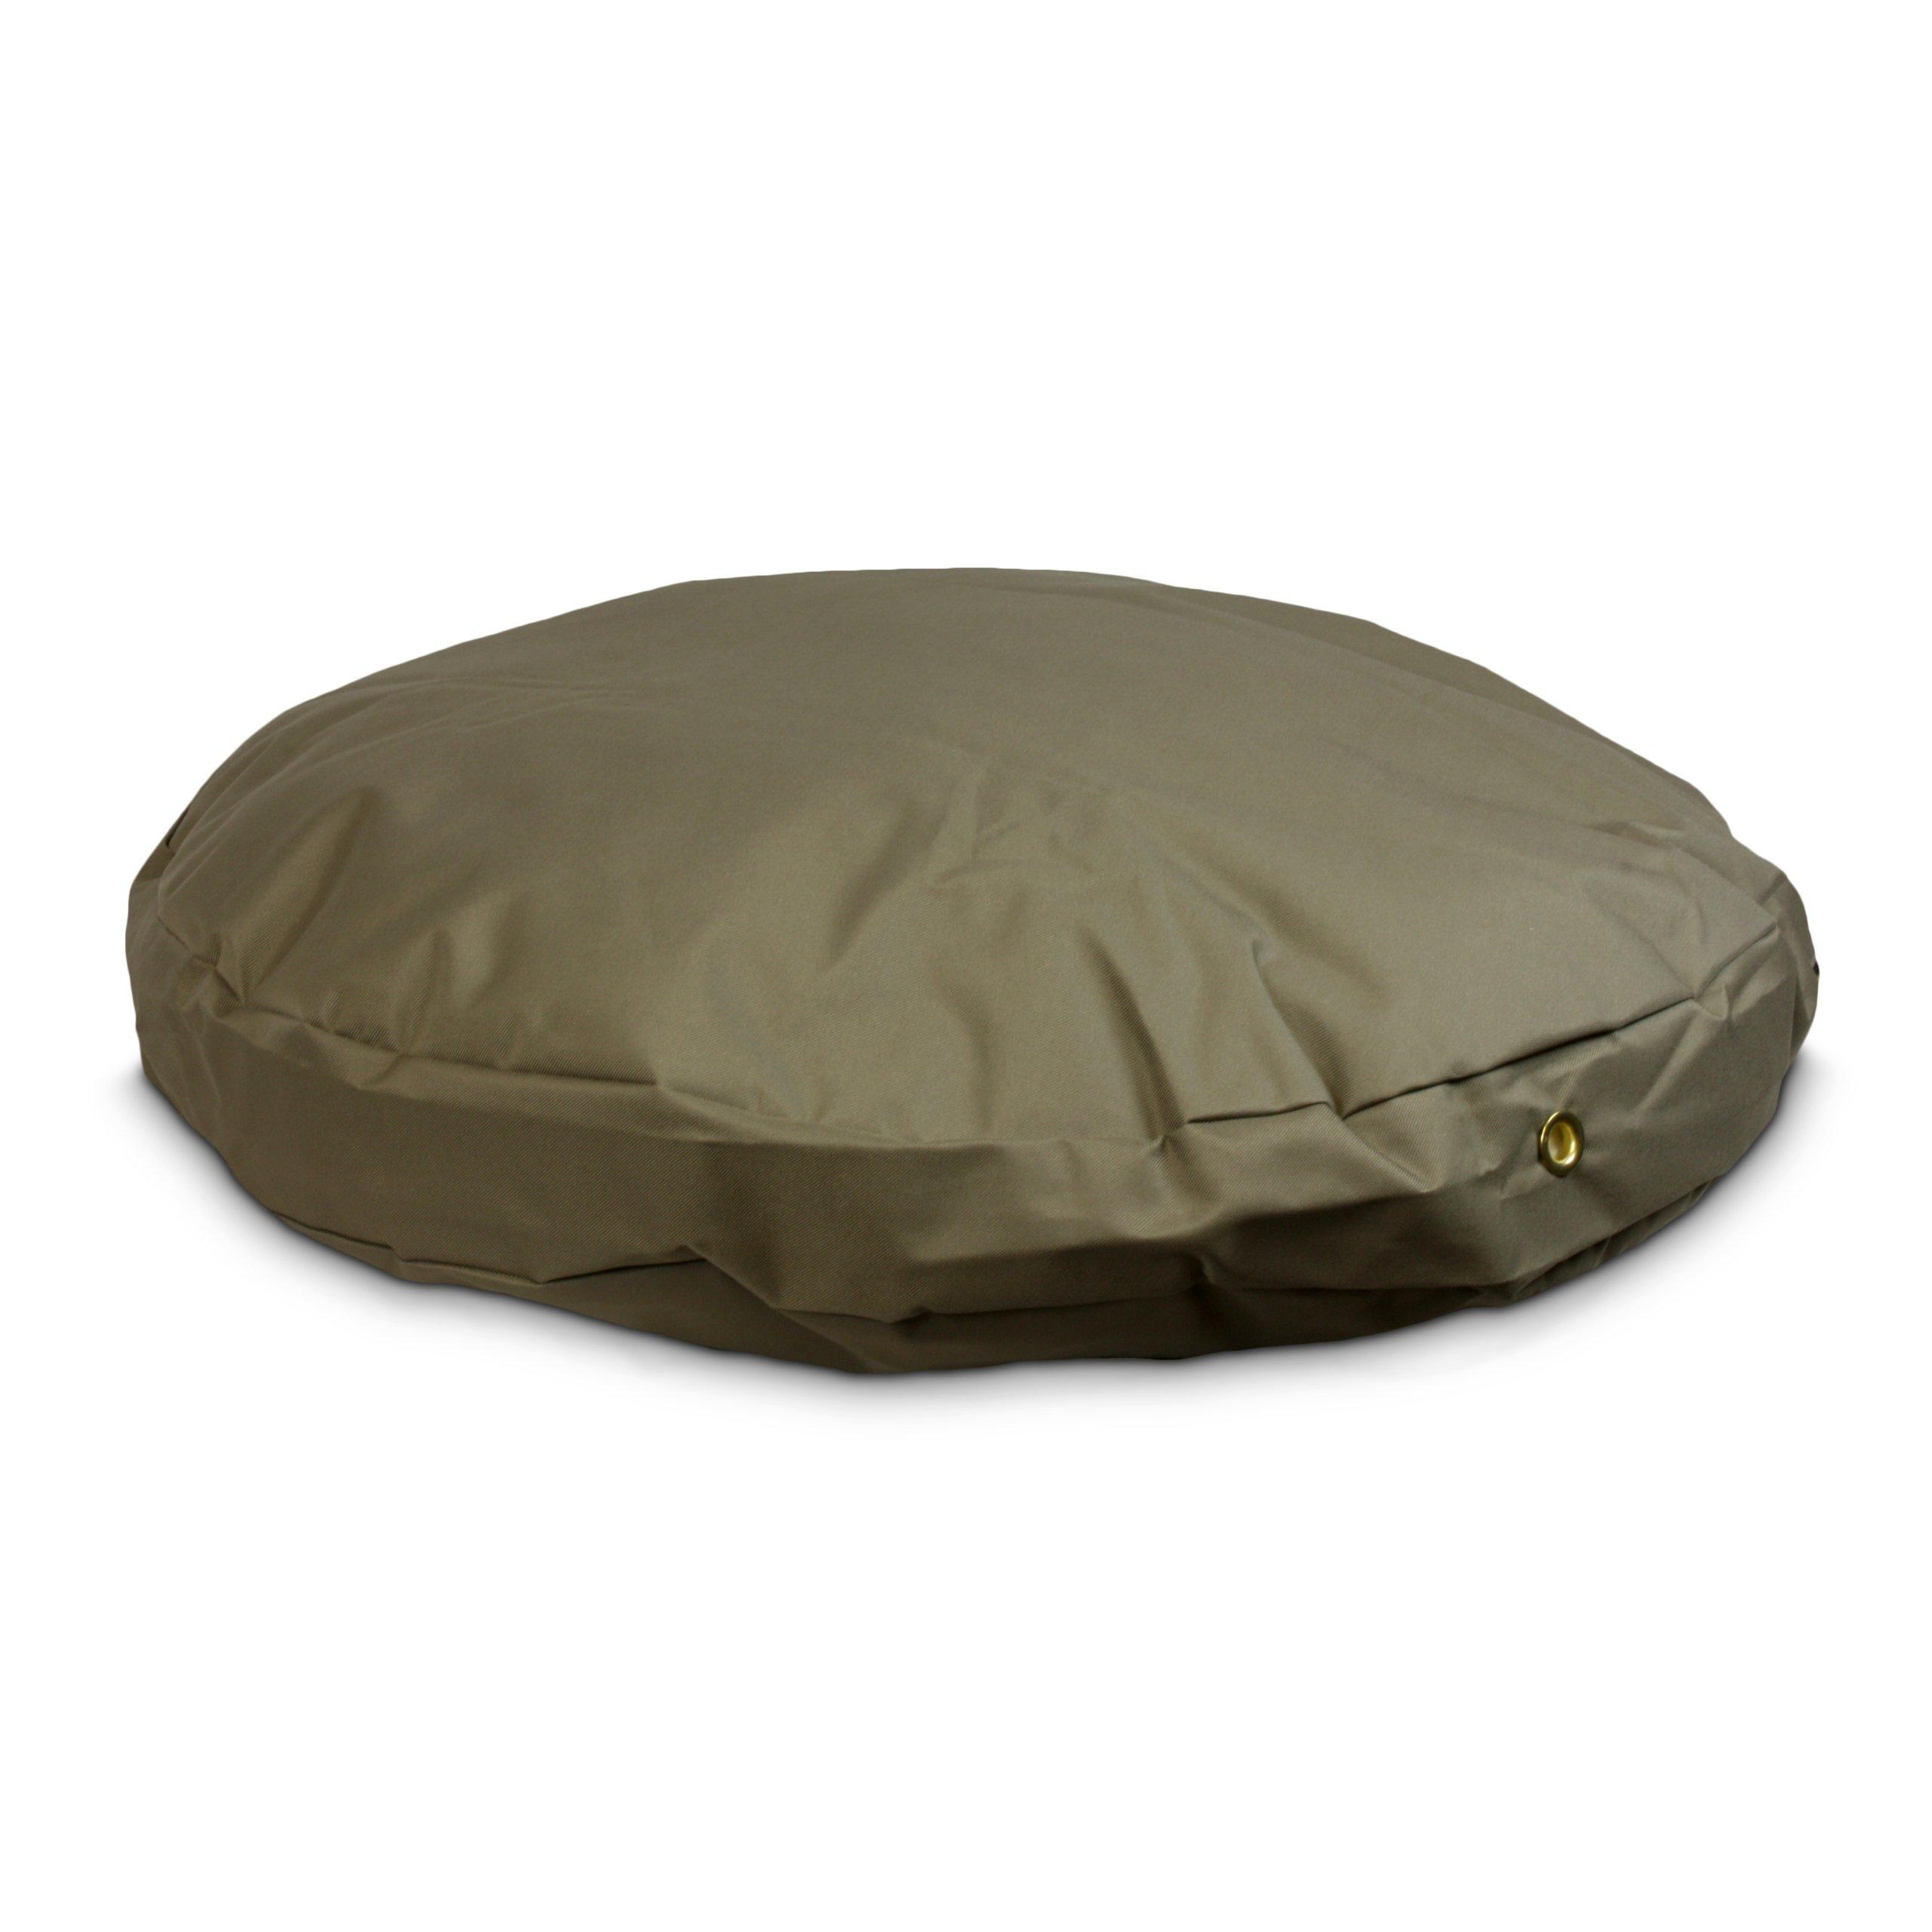 Snoozer Waterproof Round Pet Bed, Large, Hazelnut, 48-Inch